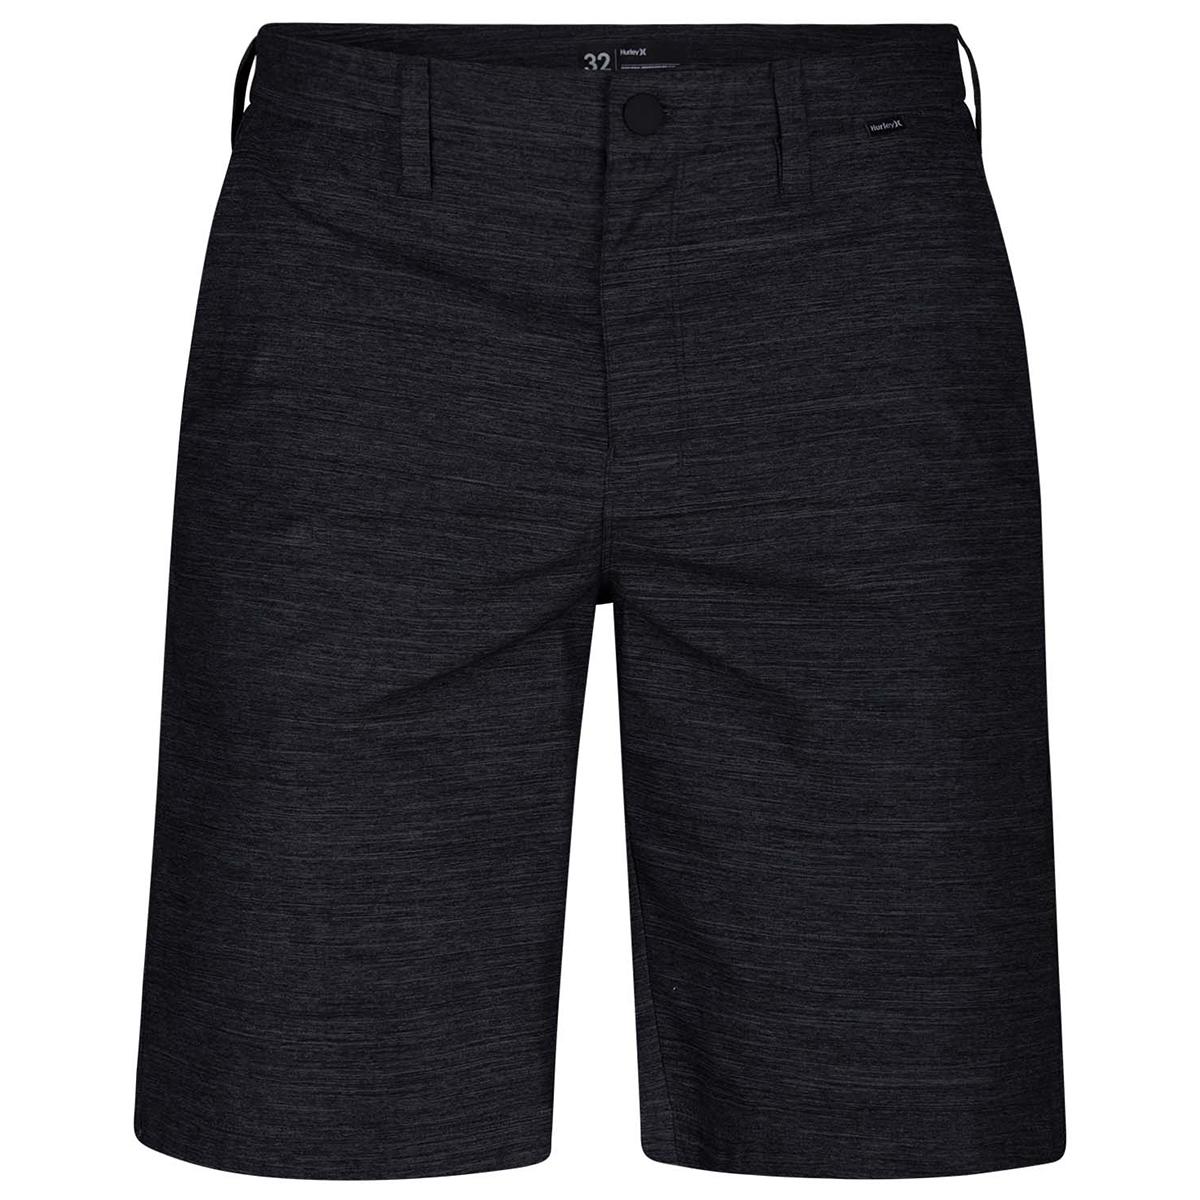 Hurley Men's Dri-Fit Breathe Chino Shorts, 21 In. - Black, 32